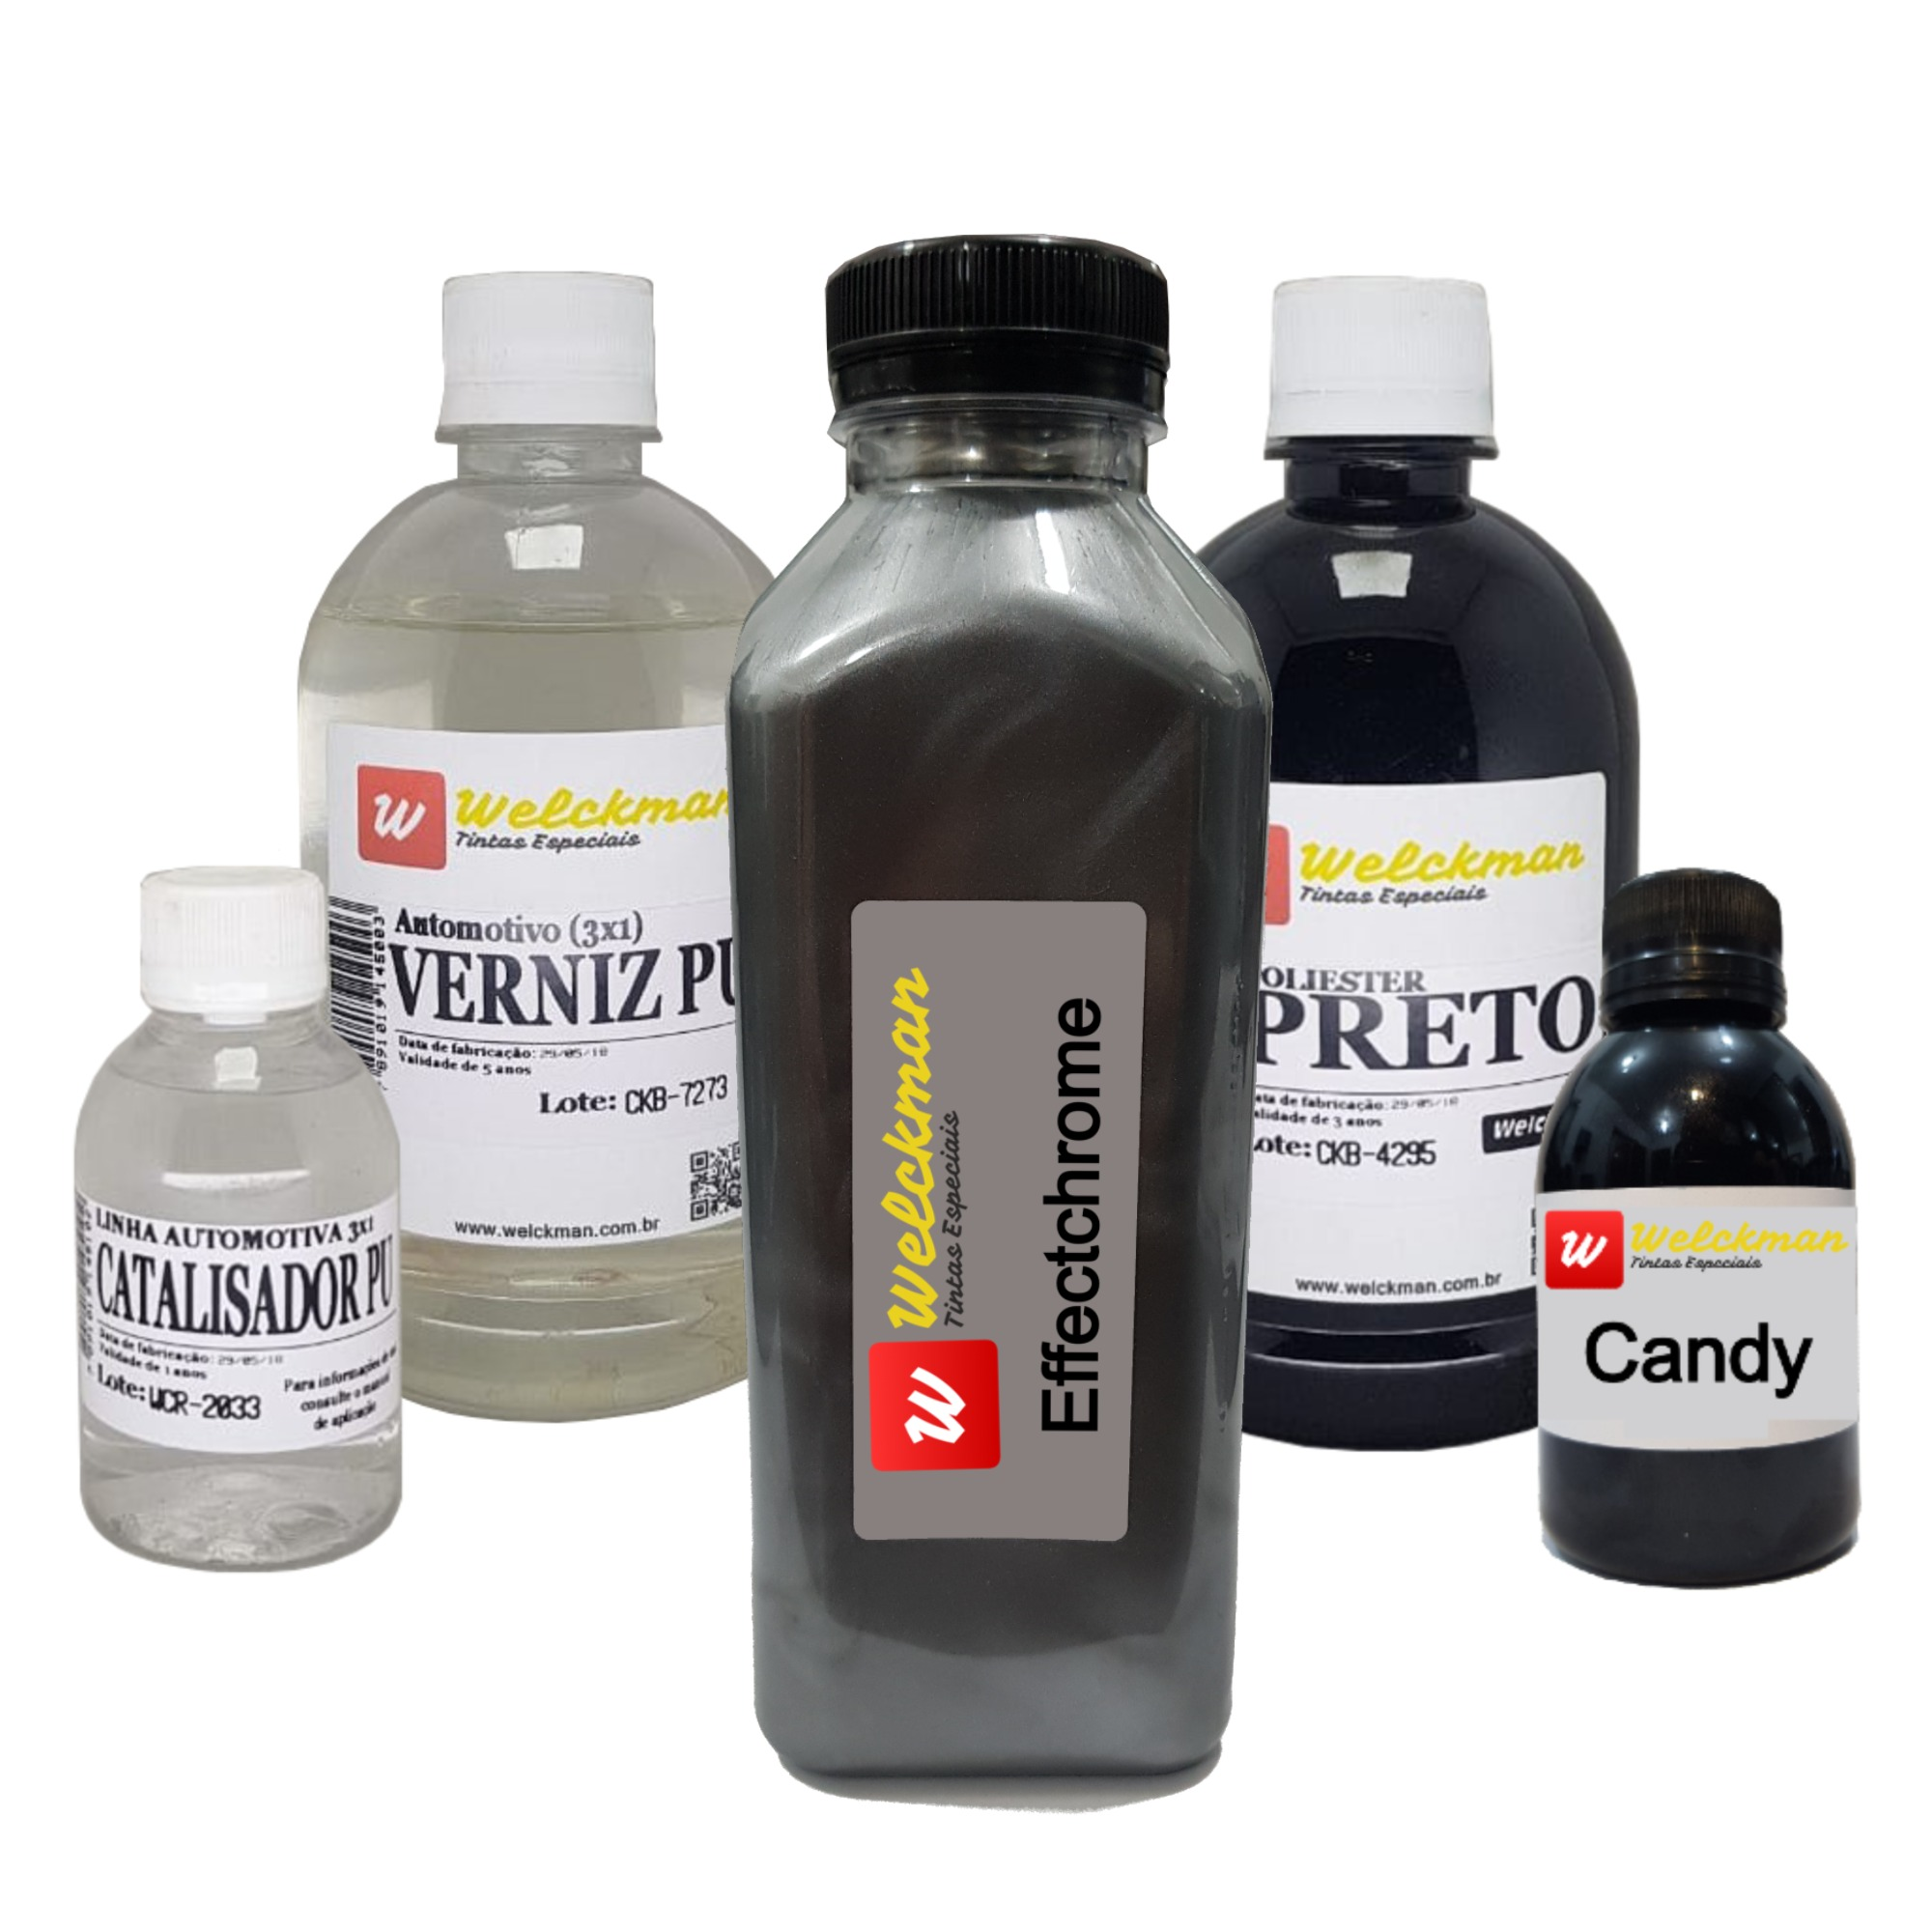 Kit Effectchrome + Base Preta + Verniz PU Alto Sólidos + Candy  - Welckman Tintas